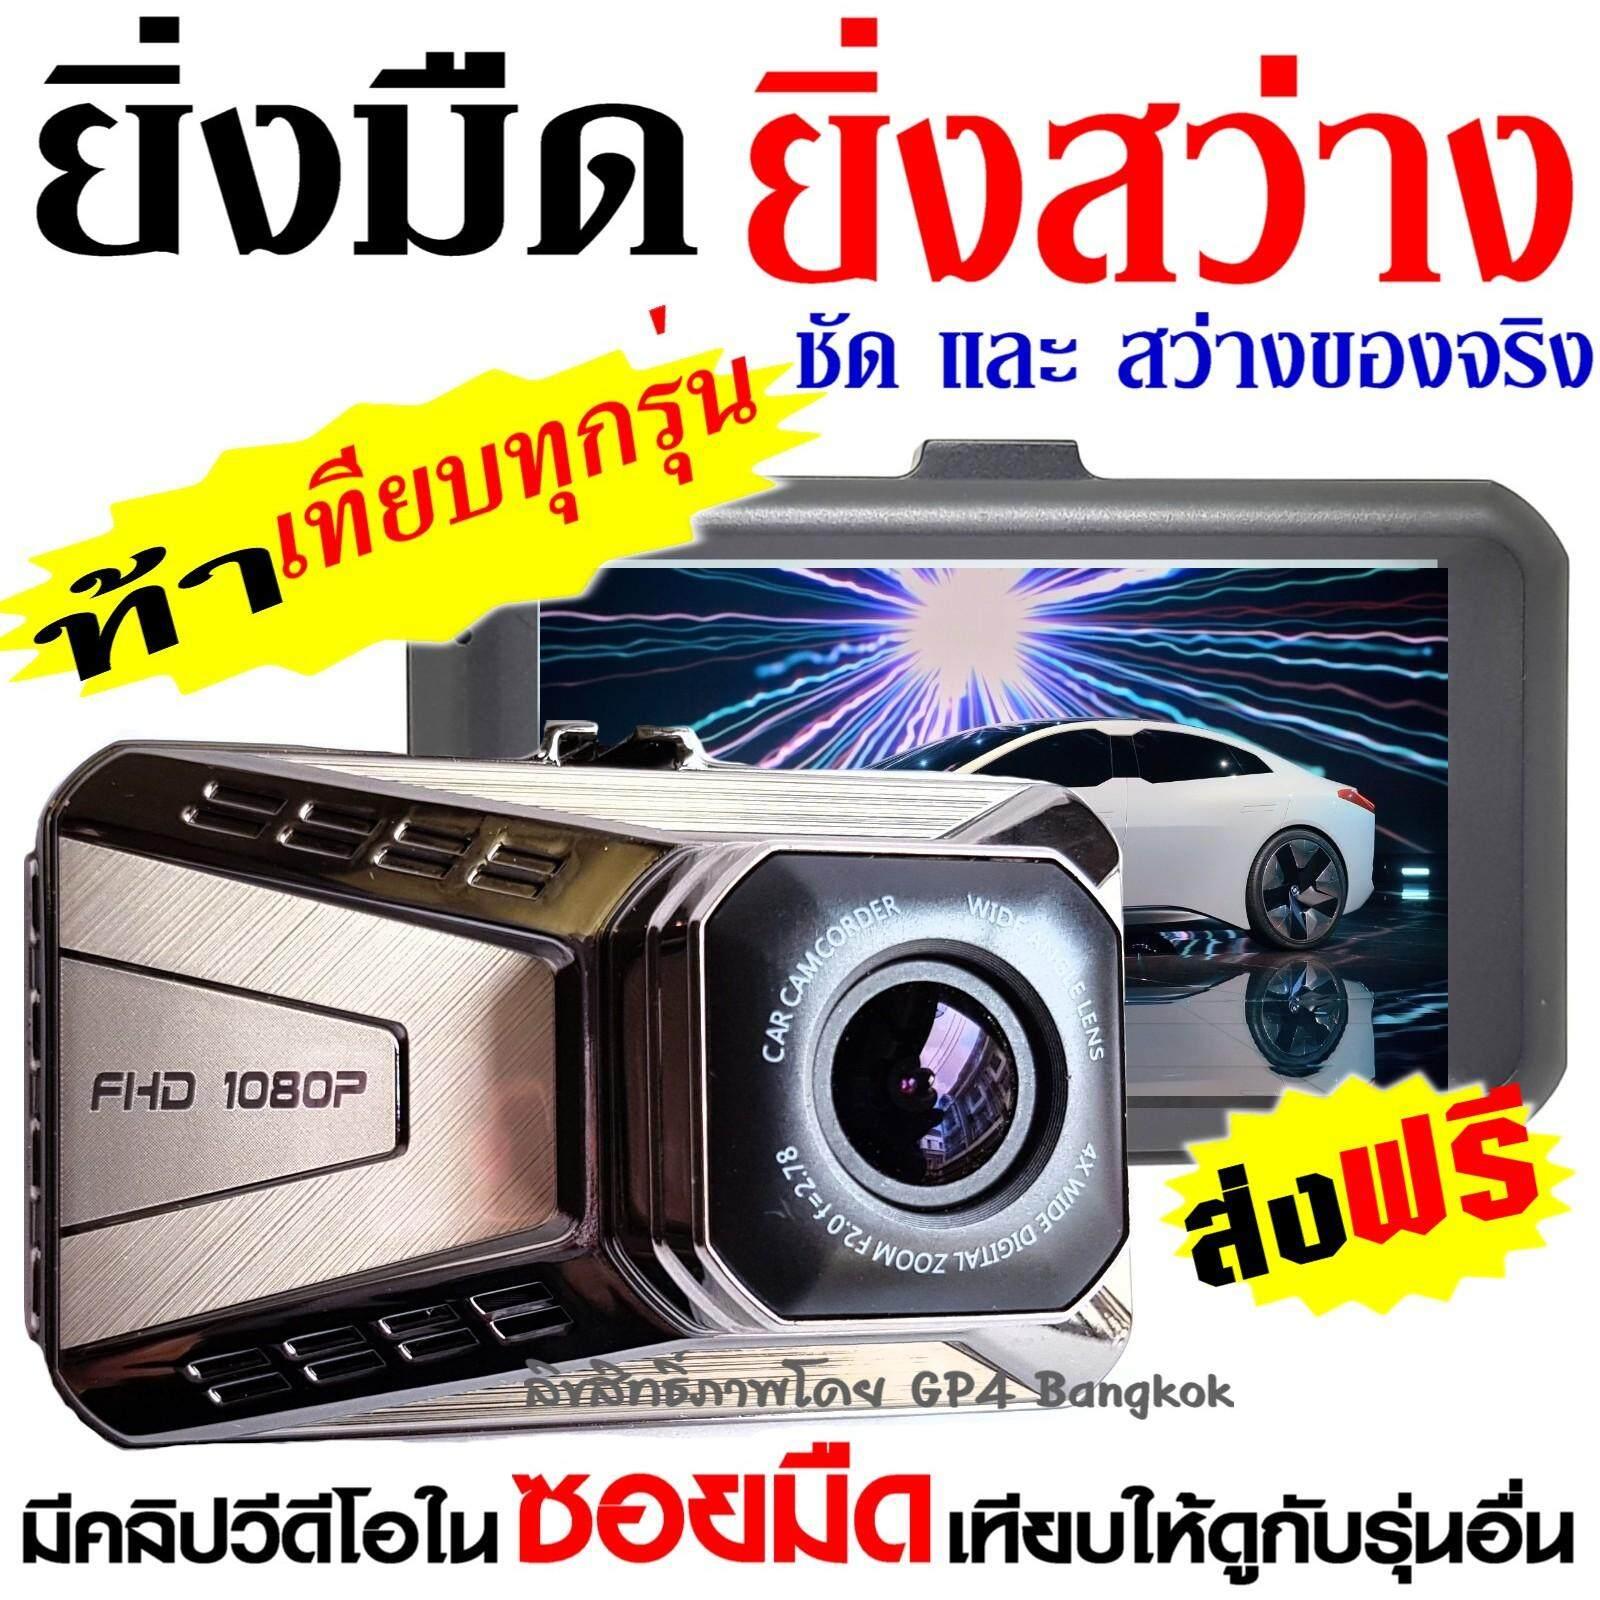 T990SE กล้องติดรถยนต์ กลางคืนสว่างที่สุด WDR + Super Night Vision + LDWS (เตือนออกนอกเลนส์) +FCWS (เตือนรถใกล้คันหน้าเกินไป) + Parking Monitor บอดี้โลหะ จอใหญ่ 3.0นิ้ว FHD 1080P เมนูไทย รุ่น T990SE (Silver)-มีคลิปวีดีโอในซอยมืดเปรียบเทียบกับรุ่นอื่นให้ดู  - ebda90f8e7d83b84c81162438044659e - รีวิวกล้องติดรถยนต์หน้า-หลัง Proof-PF800 มี GPS ราคาไม่แพง